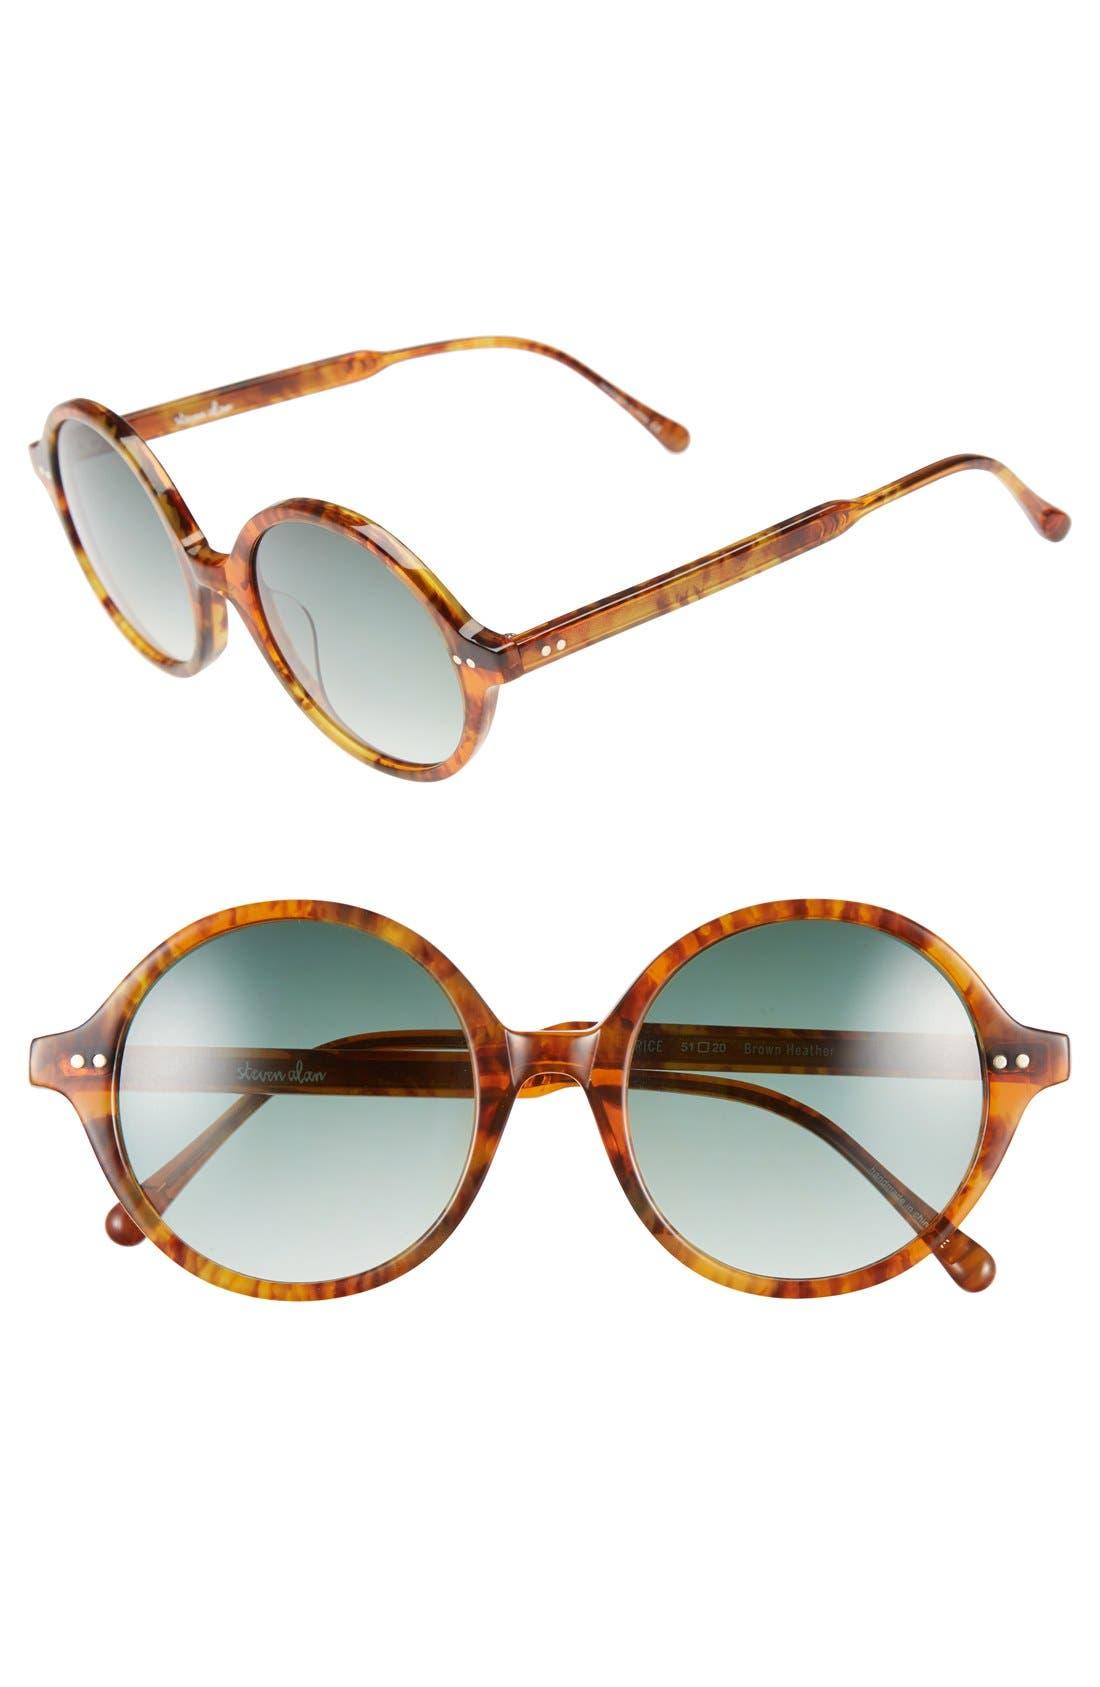 Main Image - Steven Alan 'Beatrice' 51mm Retro Sunglasses